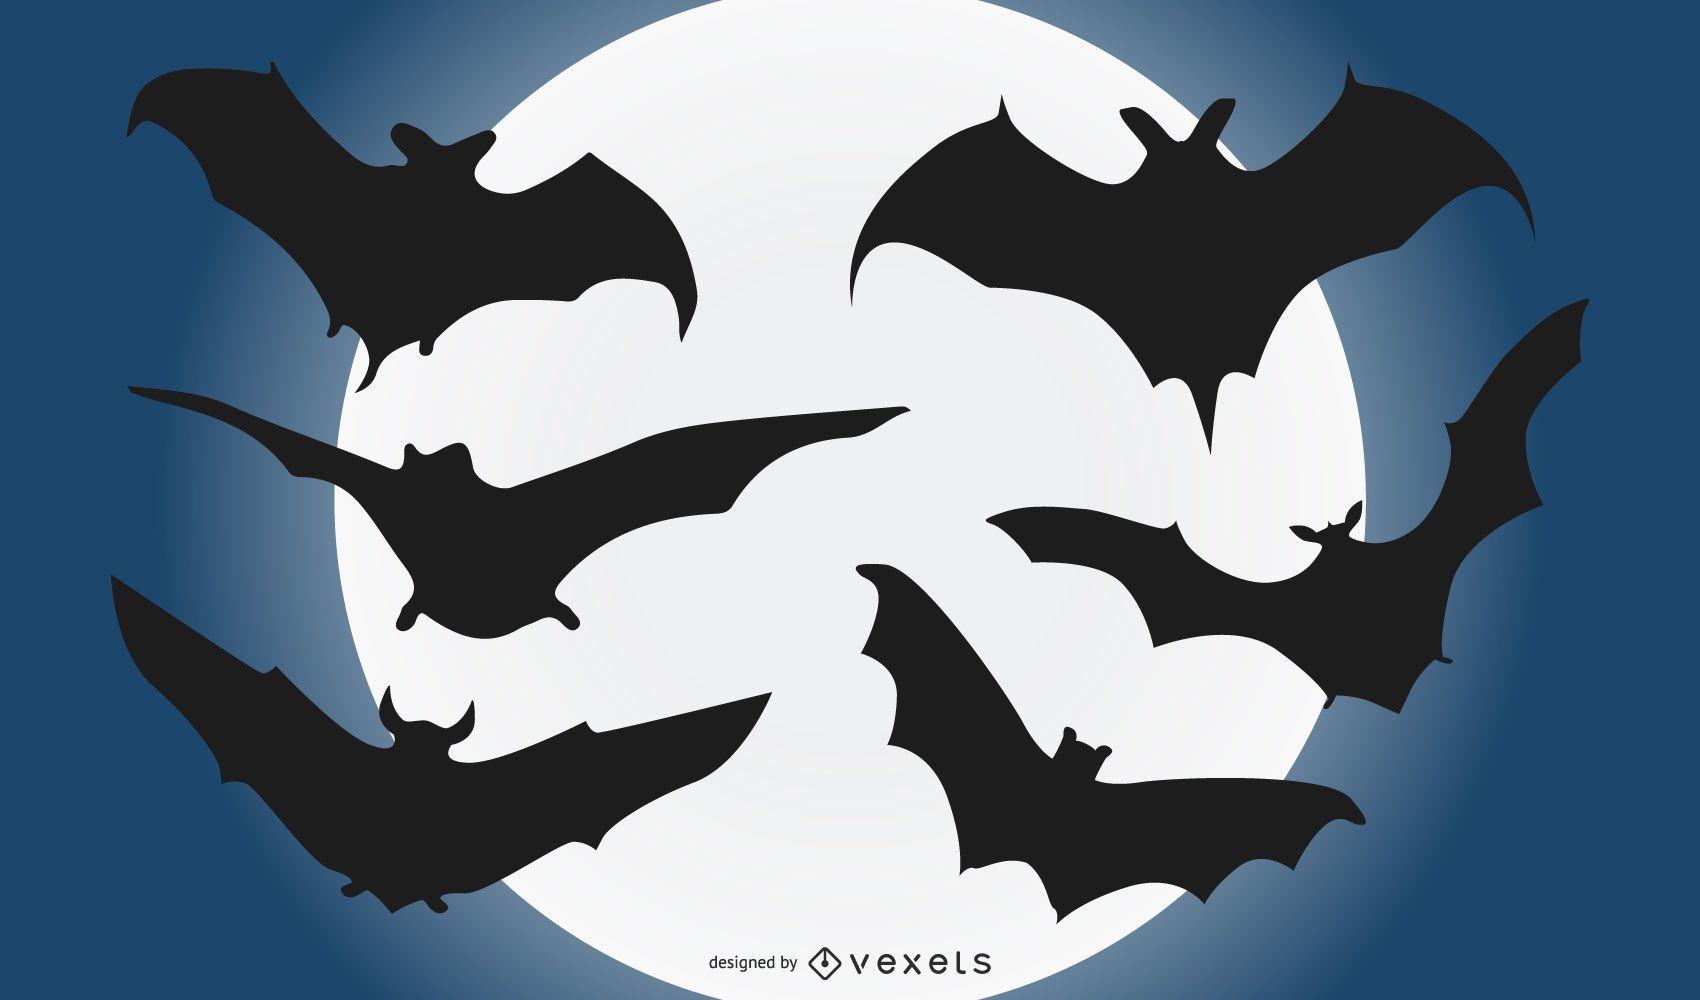 Conjunto de silueta de murciélago volando